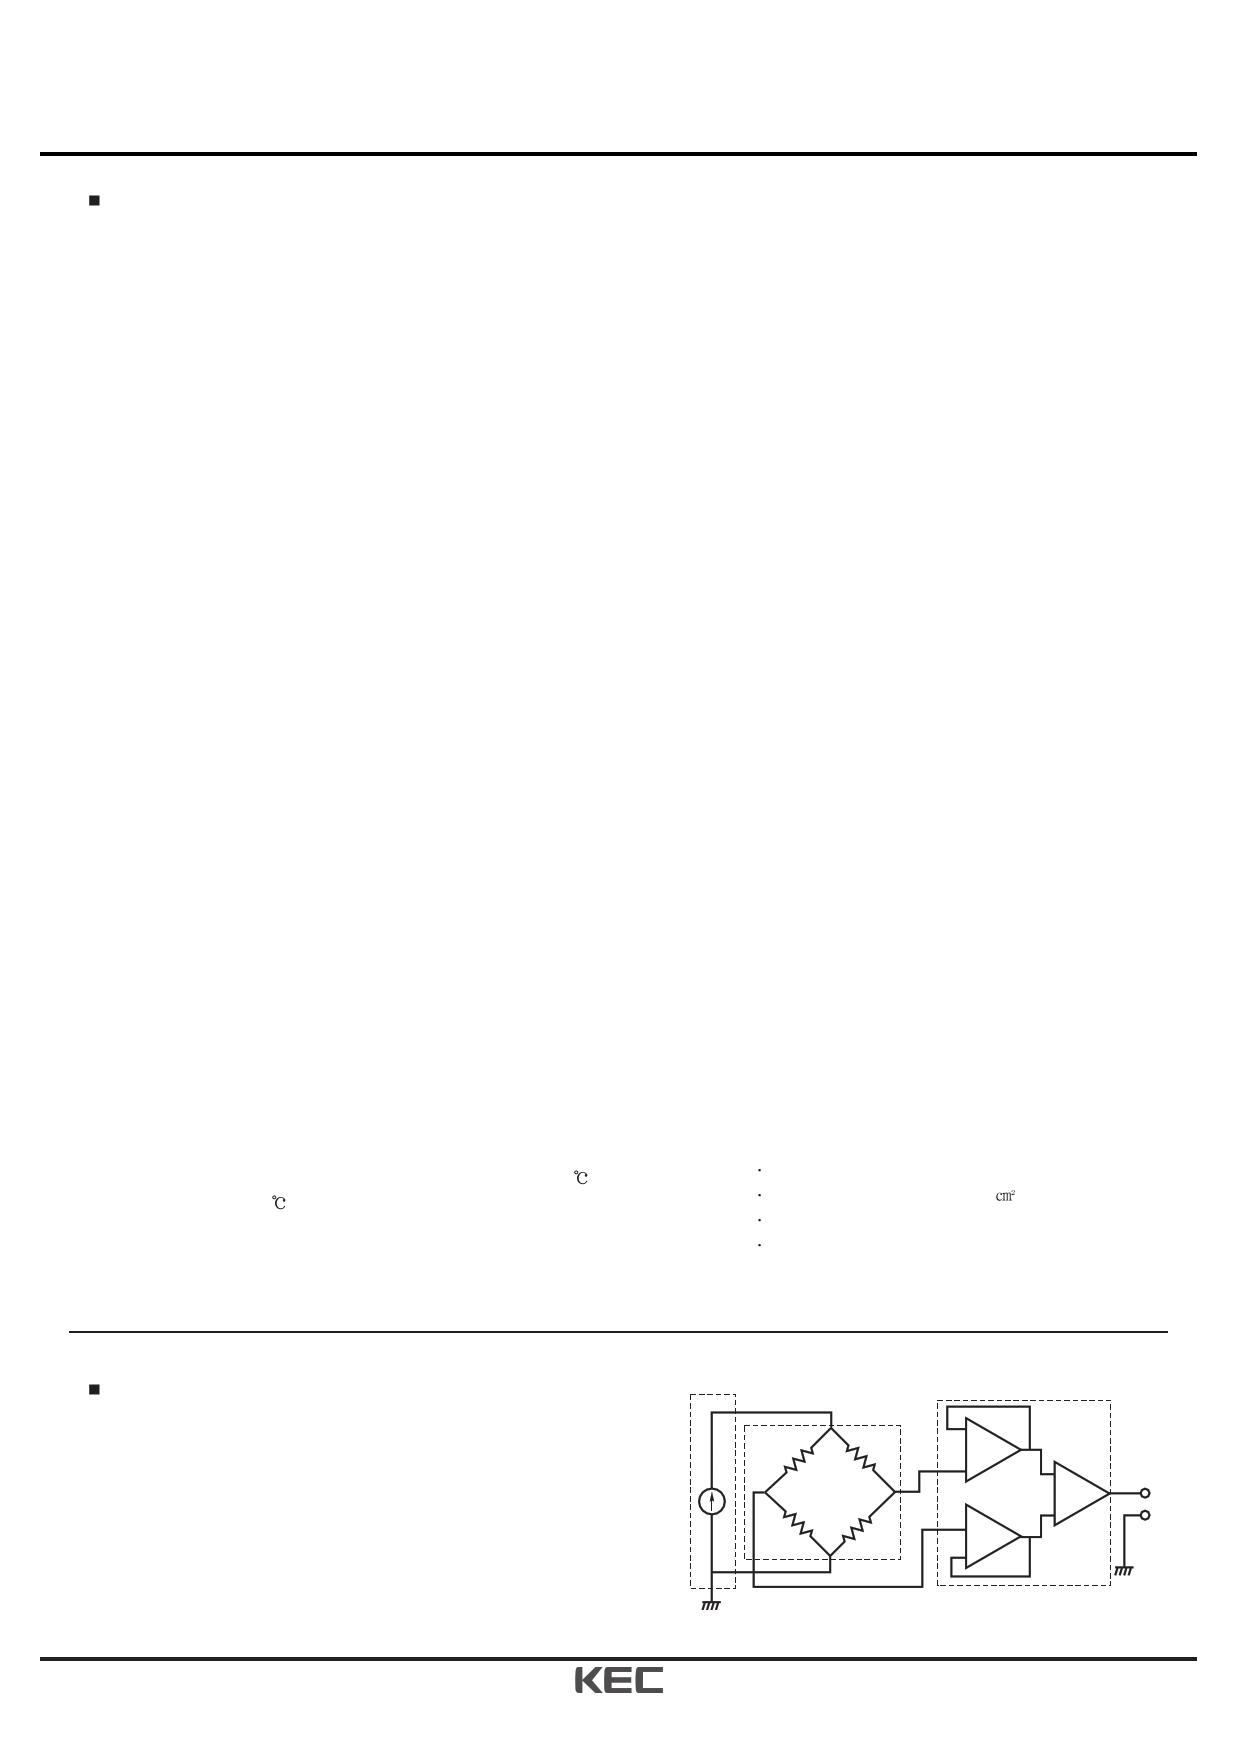 KPF801G03 pdf, 반도체, 판매, 대치품